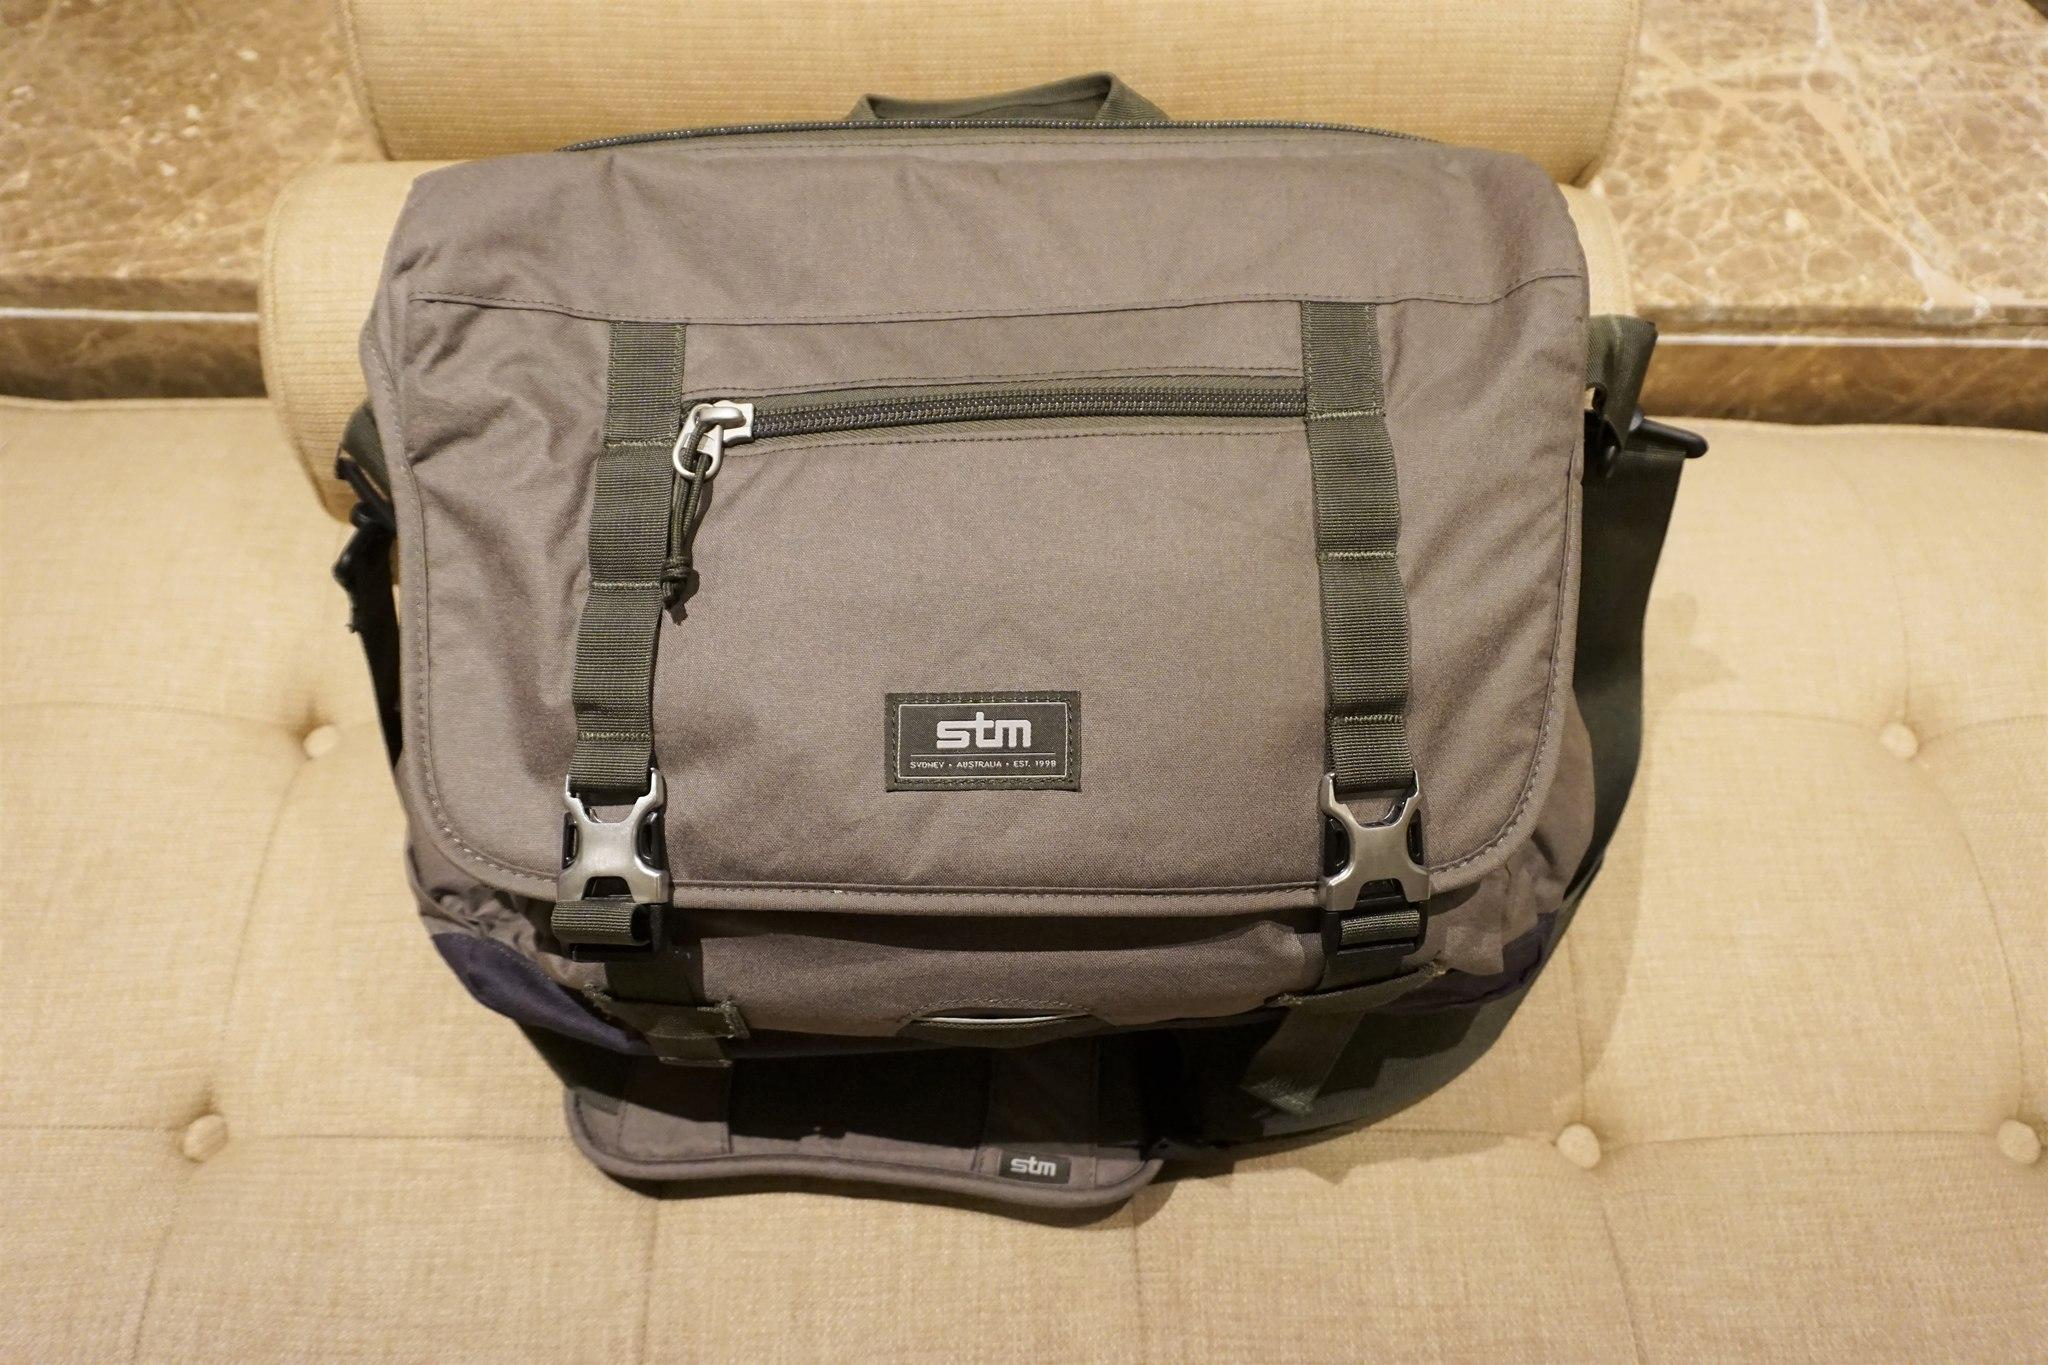 Stm Trust 15 Inch Laptop Messenger Bag 1 Pinoy Guy Guide